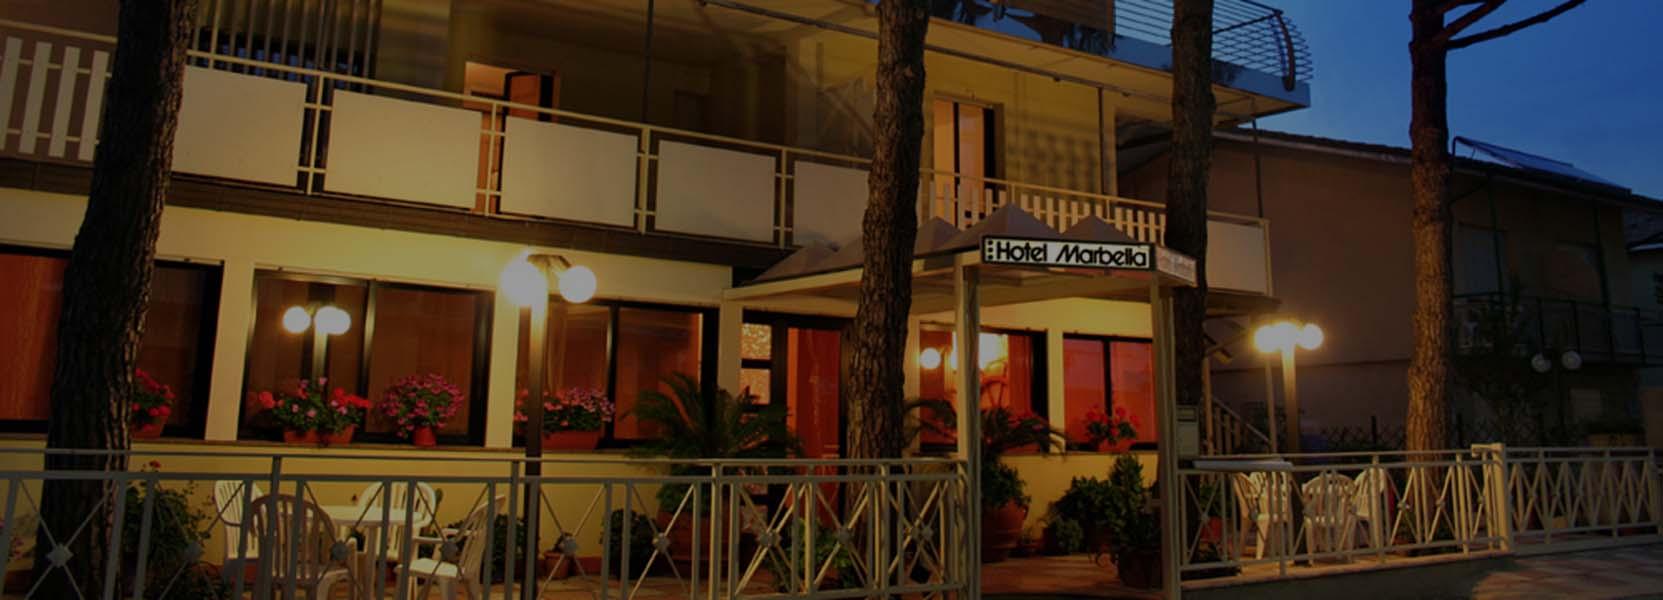 Hotel Marbella a Cervia